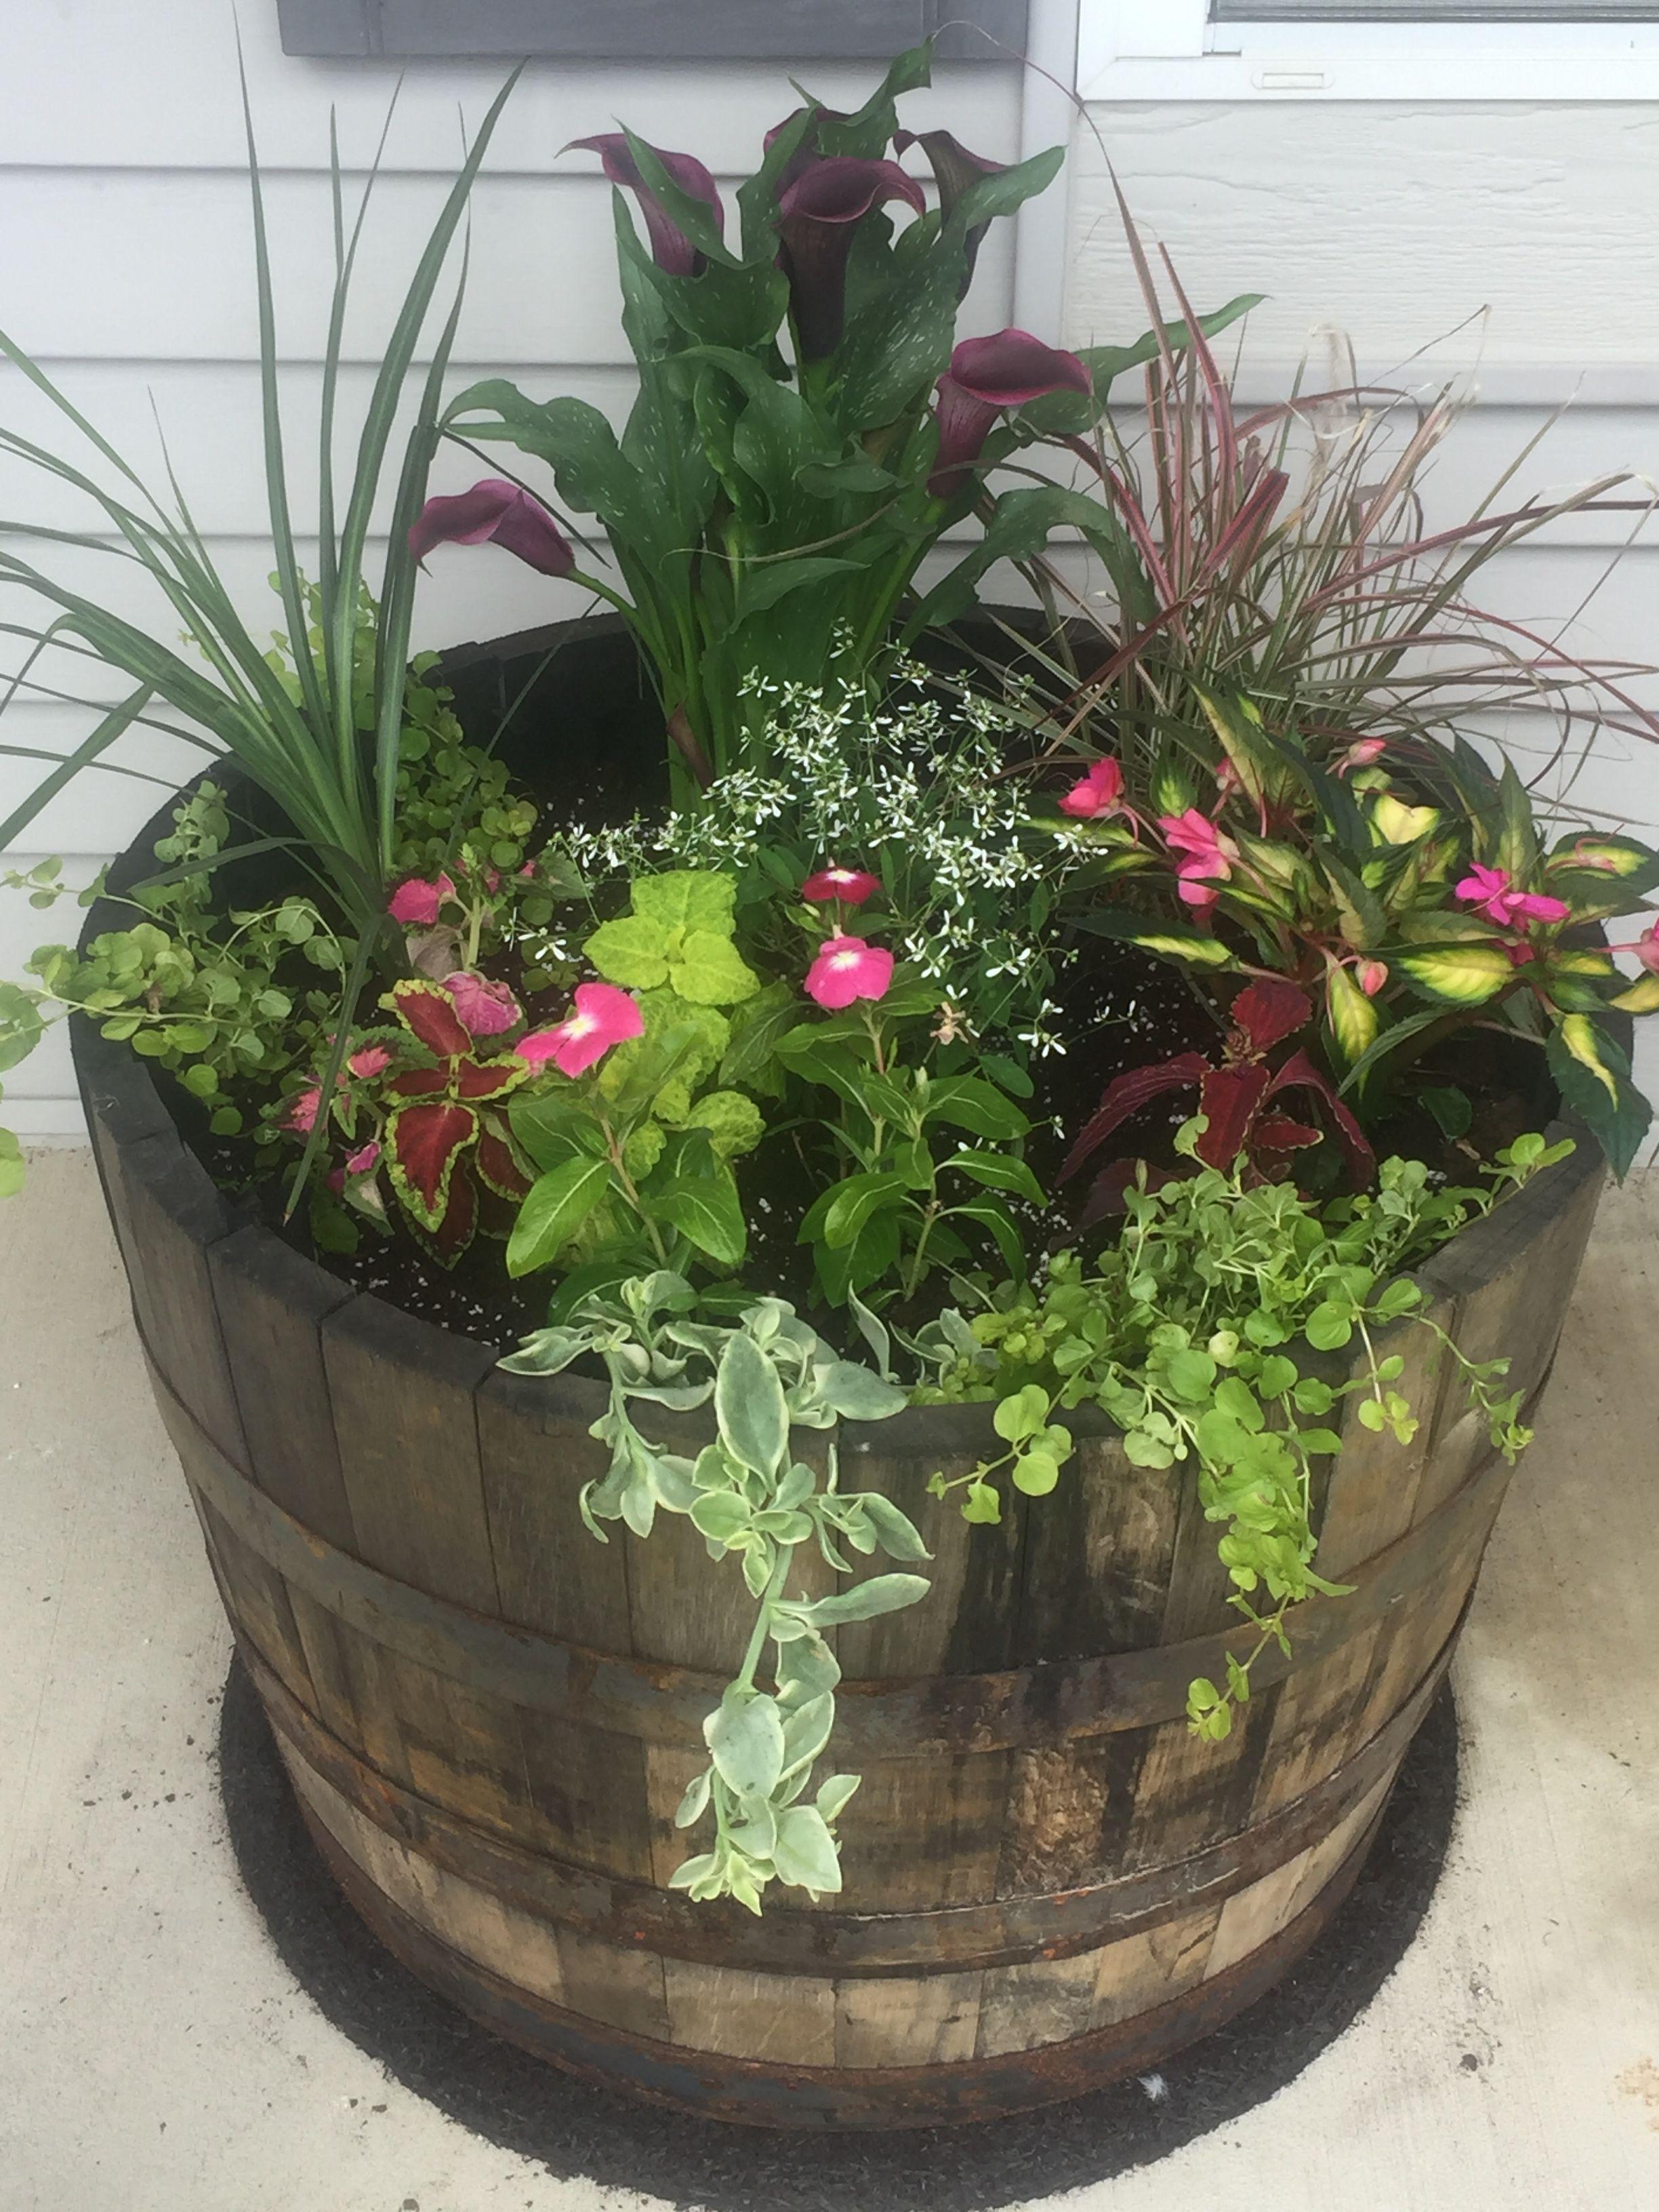 Whiskey Barrel Planter Summer 2017 Calla Lily Spikes Fountain Grass Impatiens Vinca Euphorbia Coleu Wine Barrel Planter Garden Plant Pots Barrel Planter